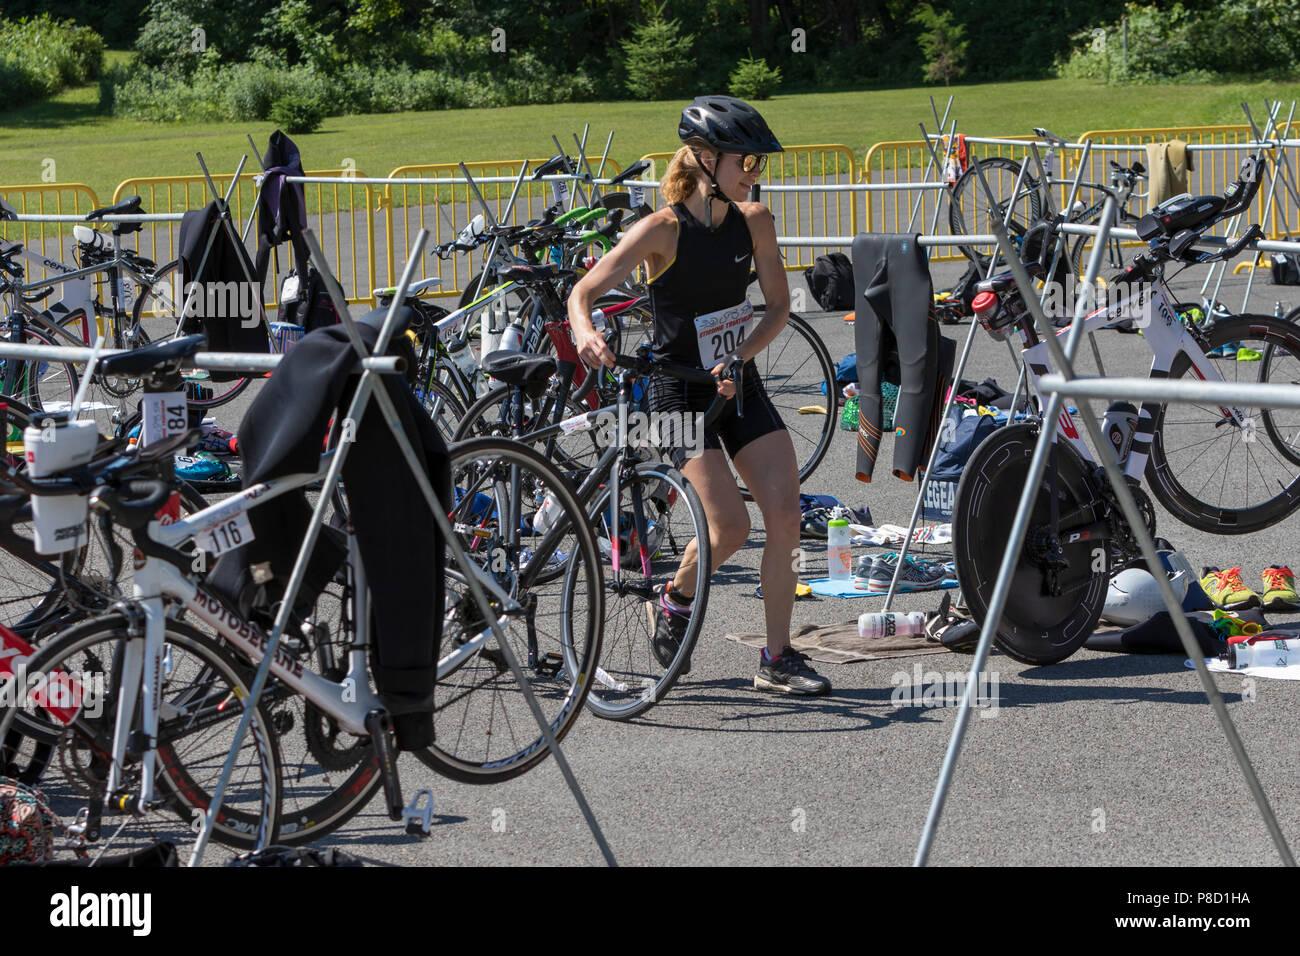 Mariola Moeyaert competiting in the bike segment in the 2018 Stissing Triathlon - Stock Image